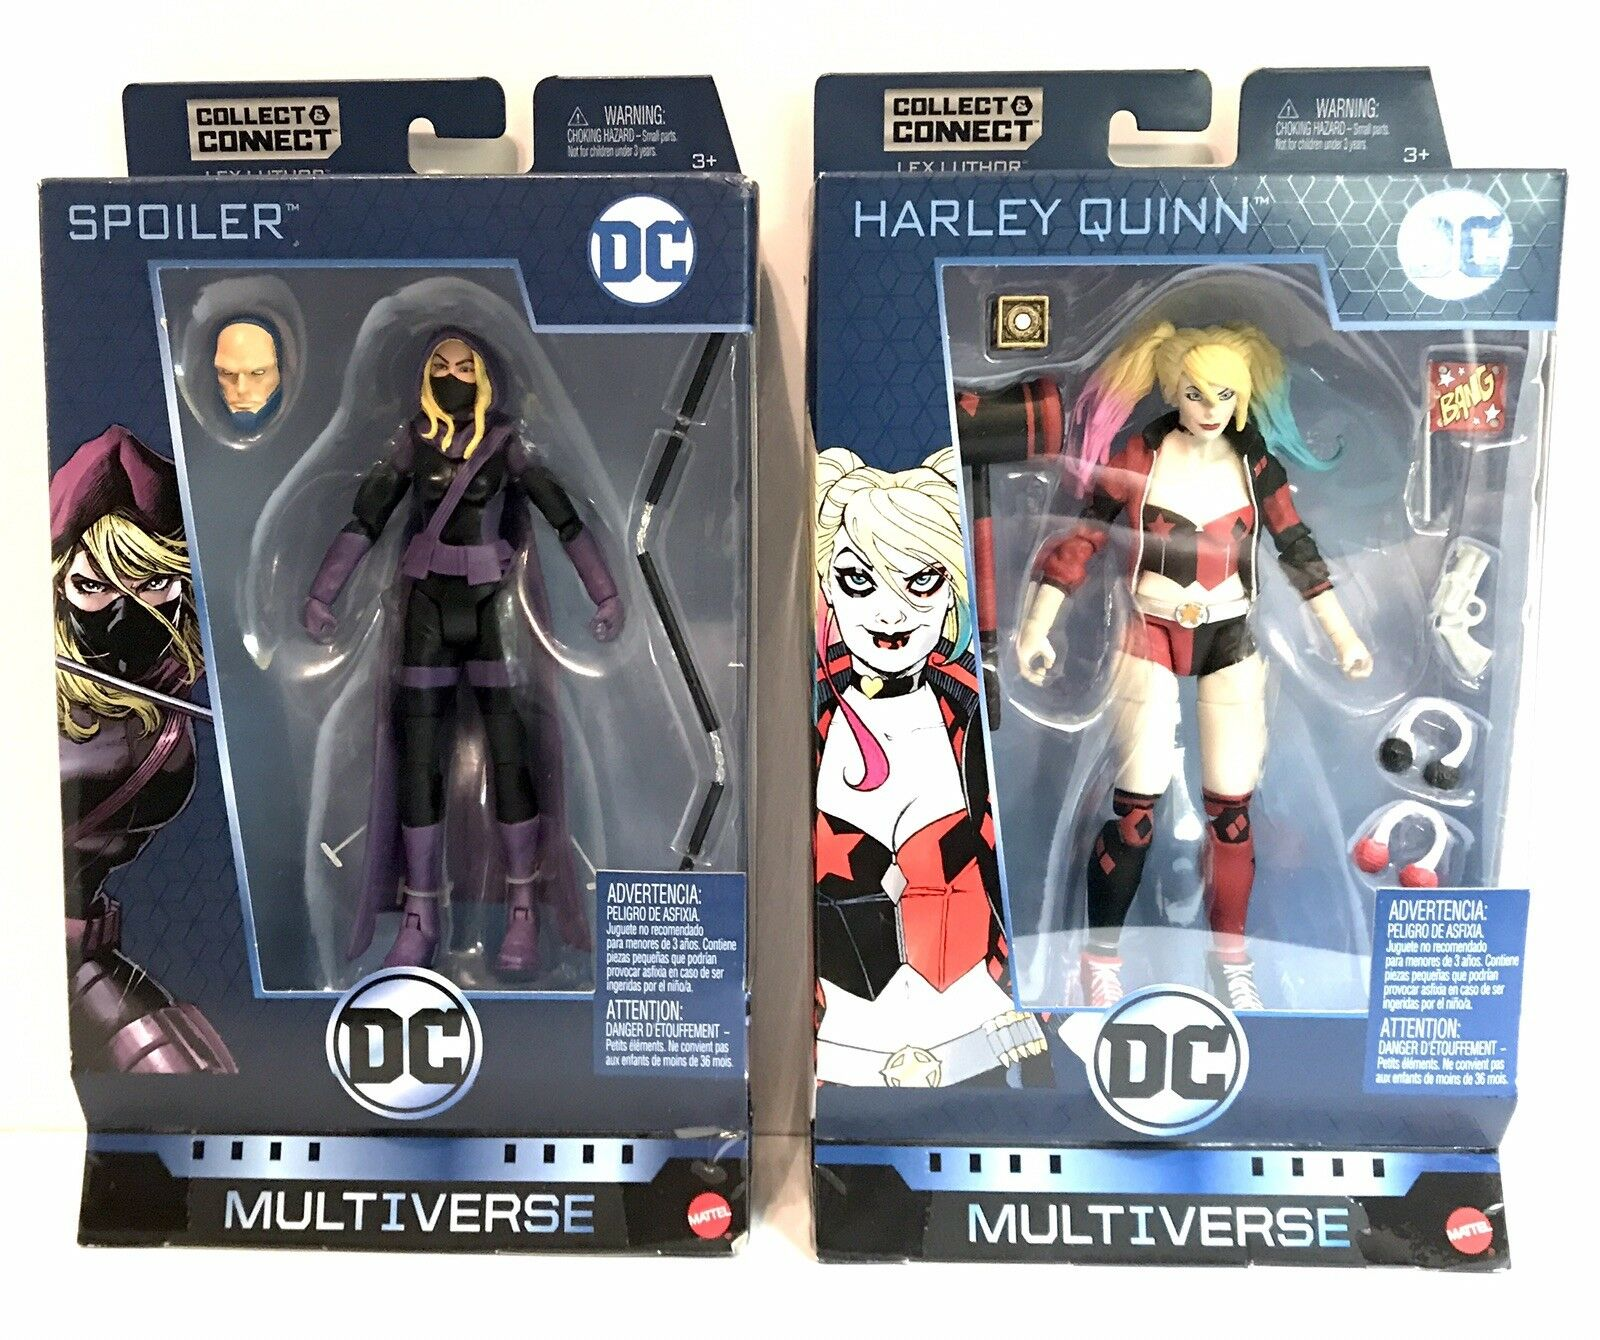 DC COMICS MULTIVERSE SPOILER & HARLEY QUINN  LEX LUTHOR WAVE  EXCLUSIVE